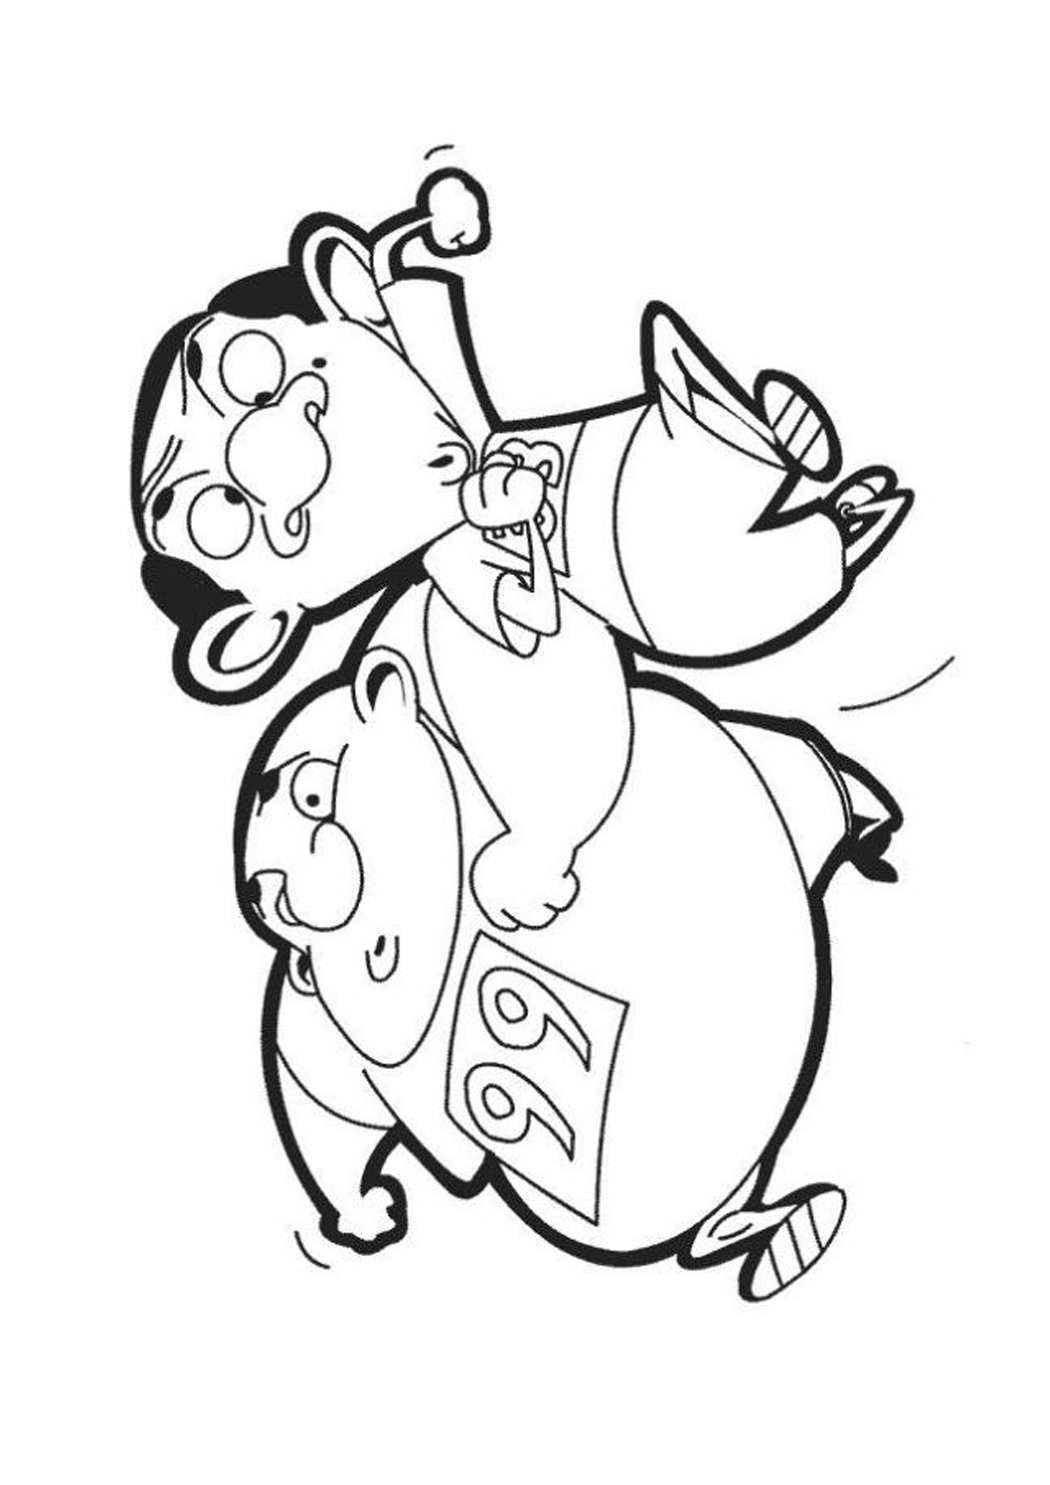 Youutube Kleurplaat Kinderfilmpjes Mr Bean